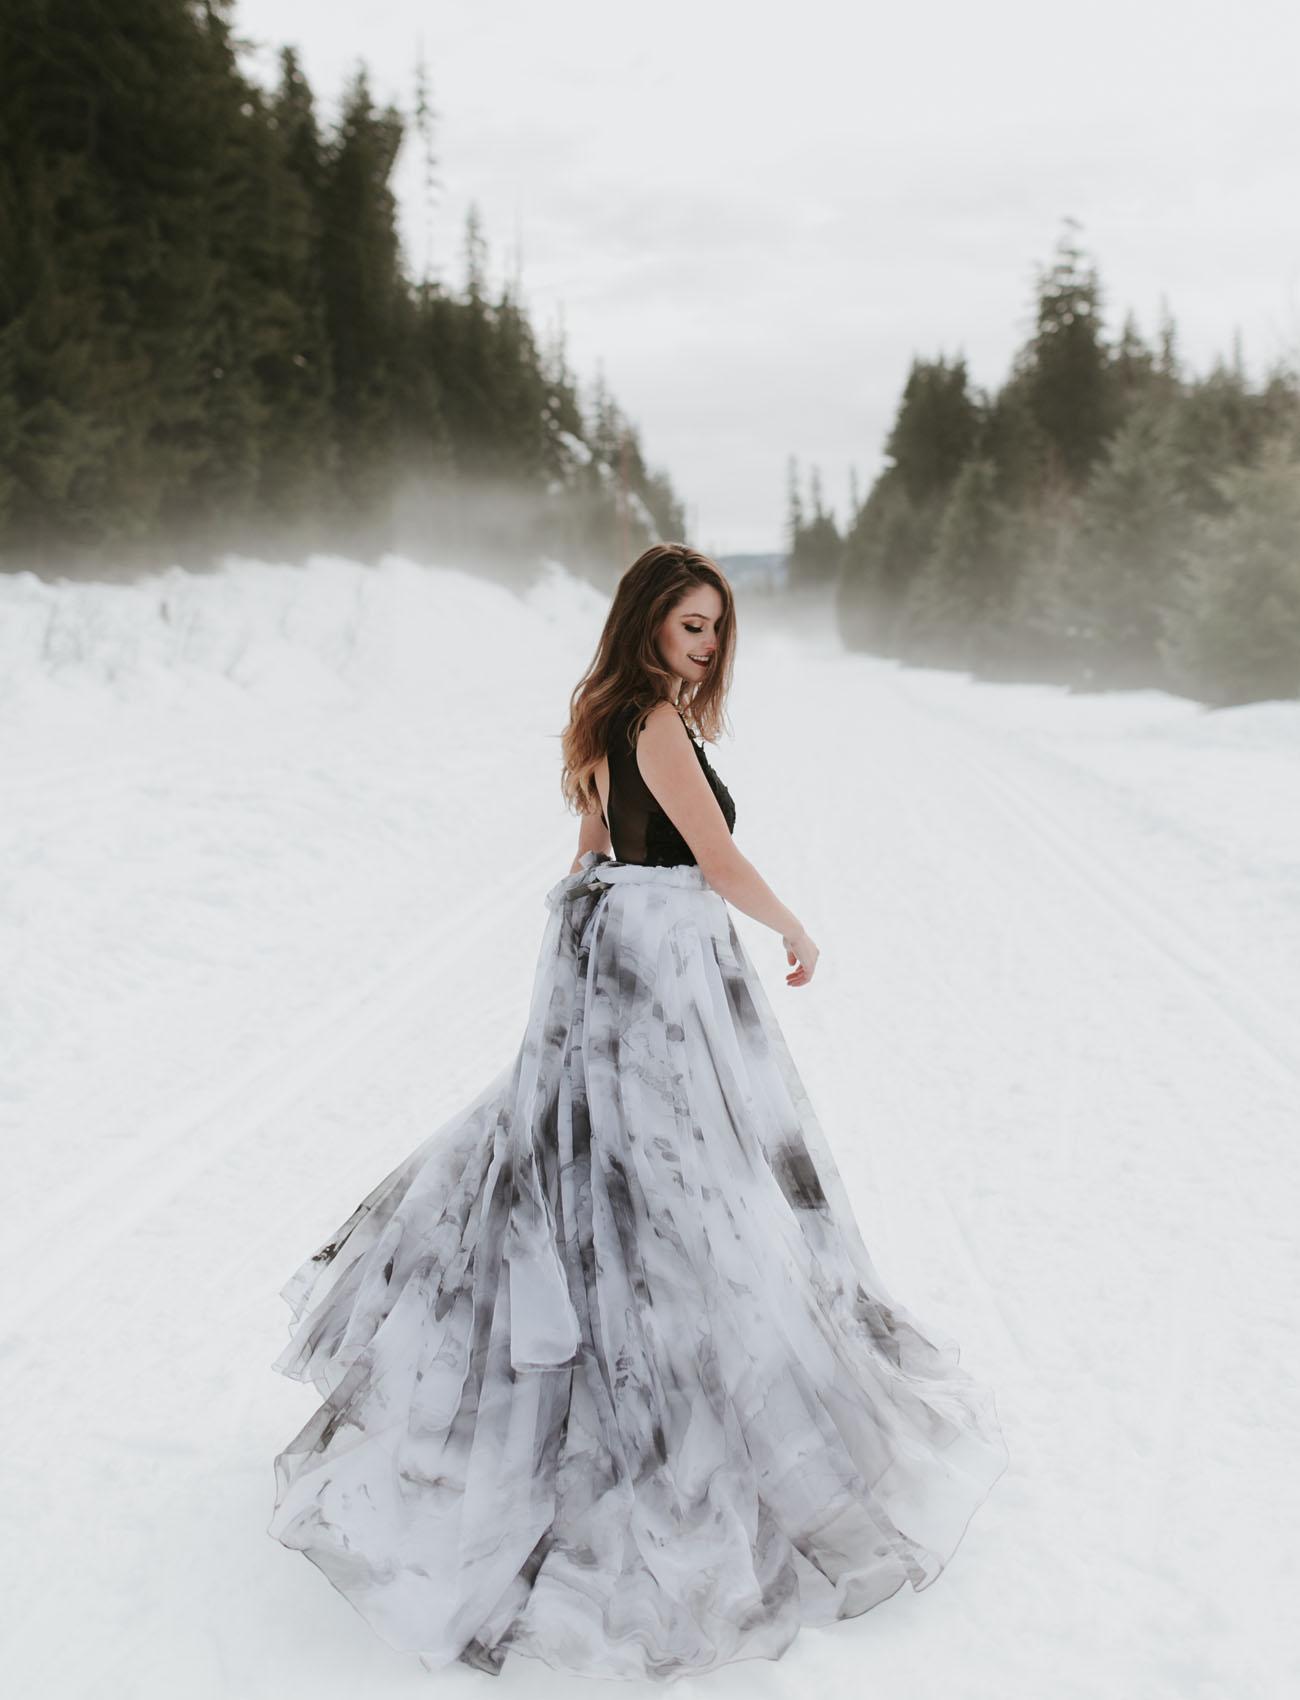 Black & White Wedding Dress